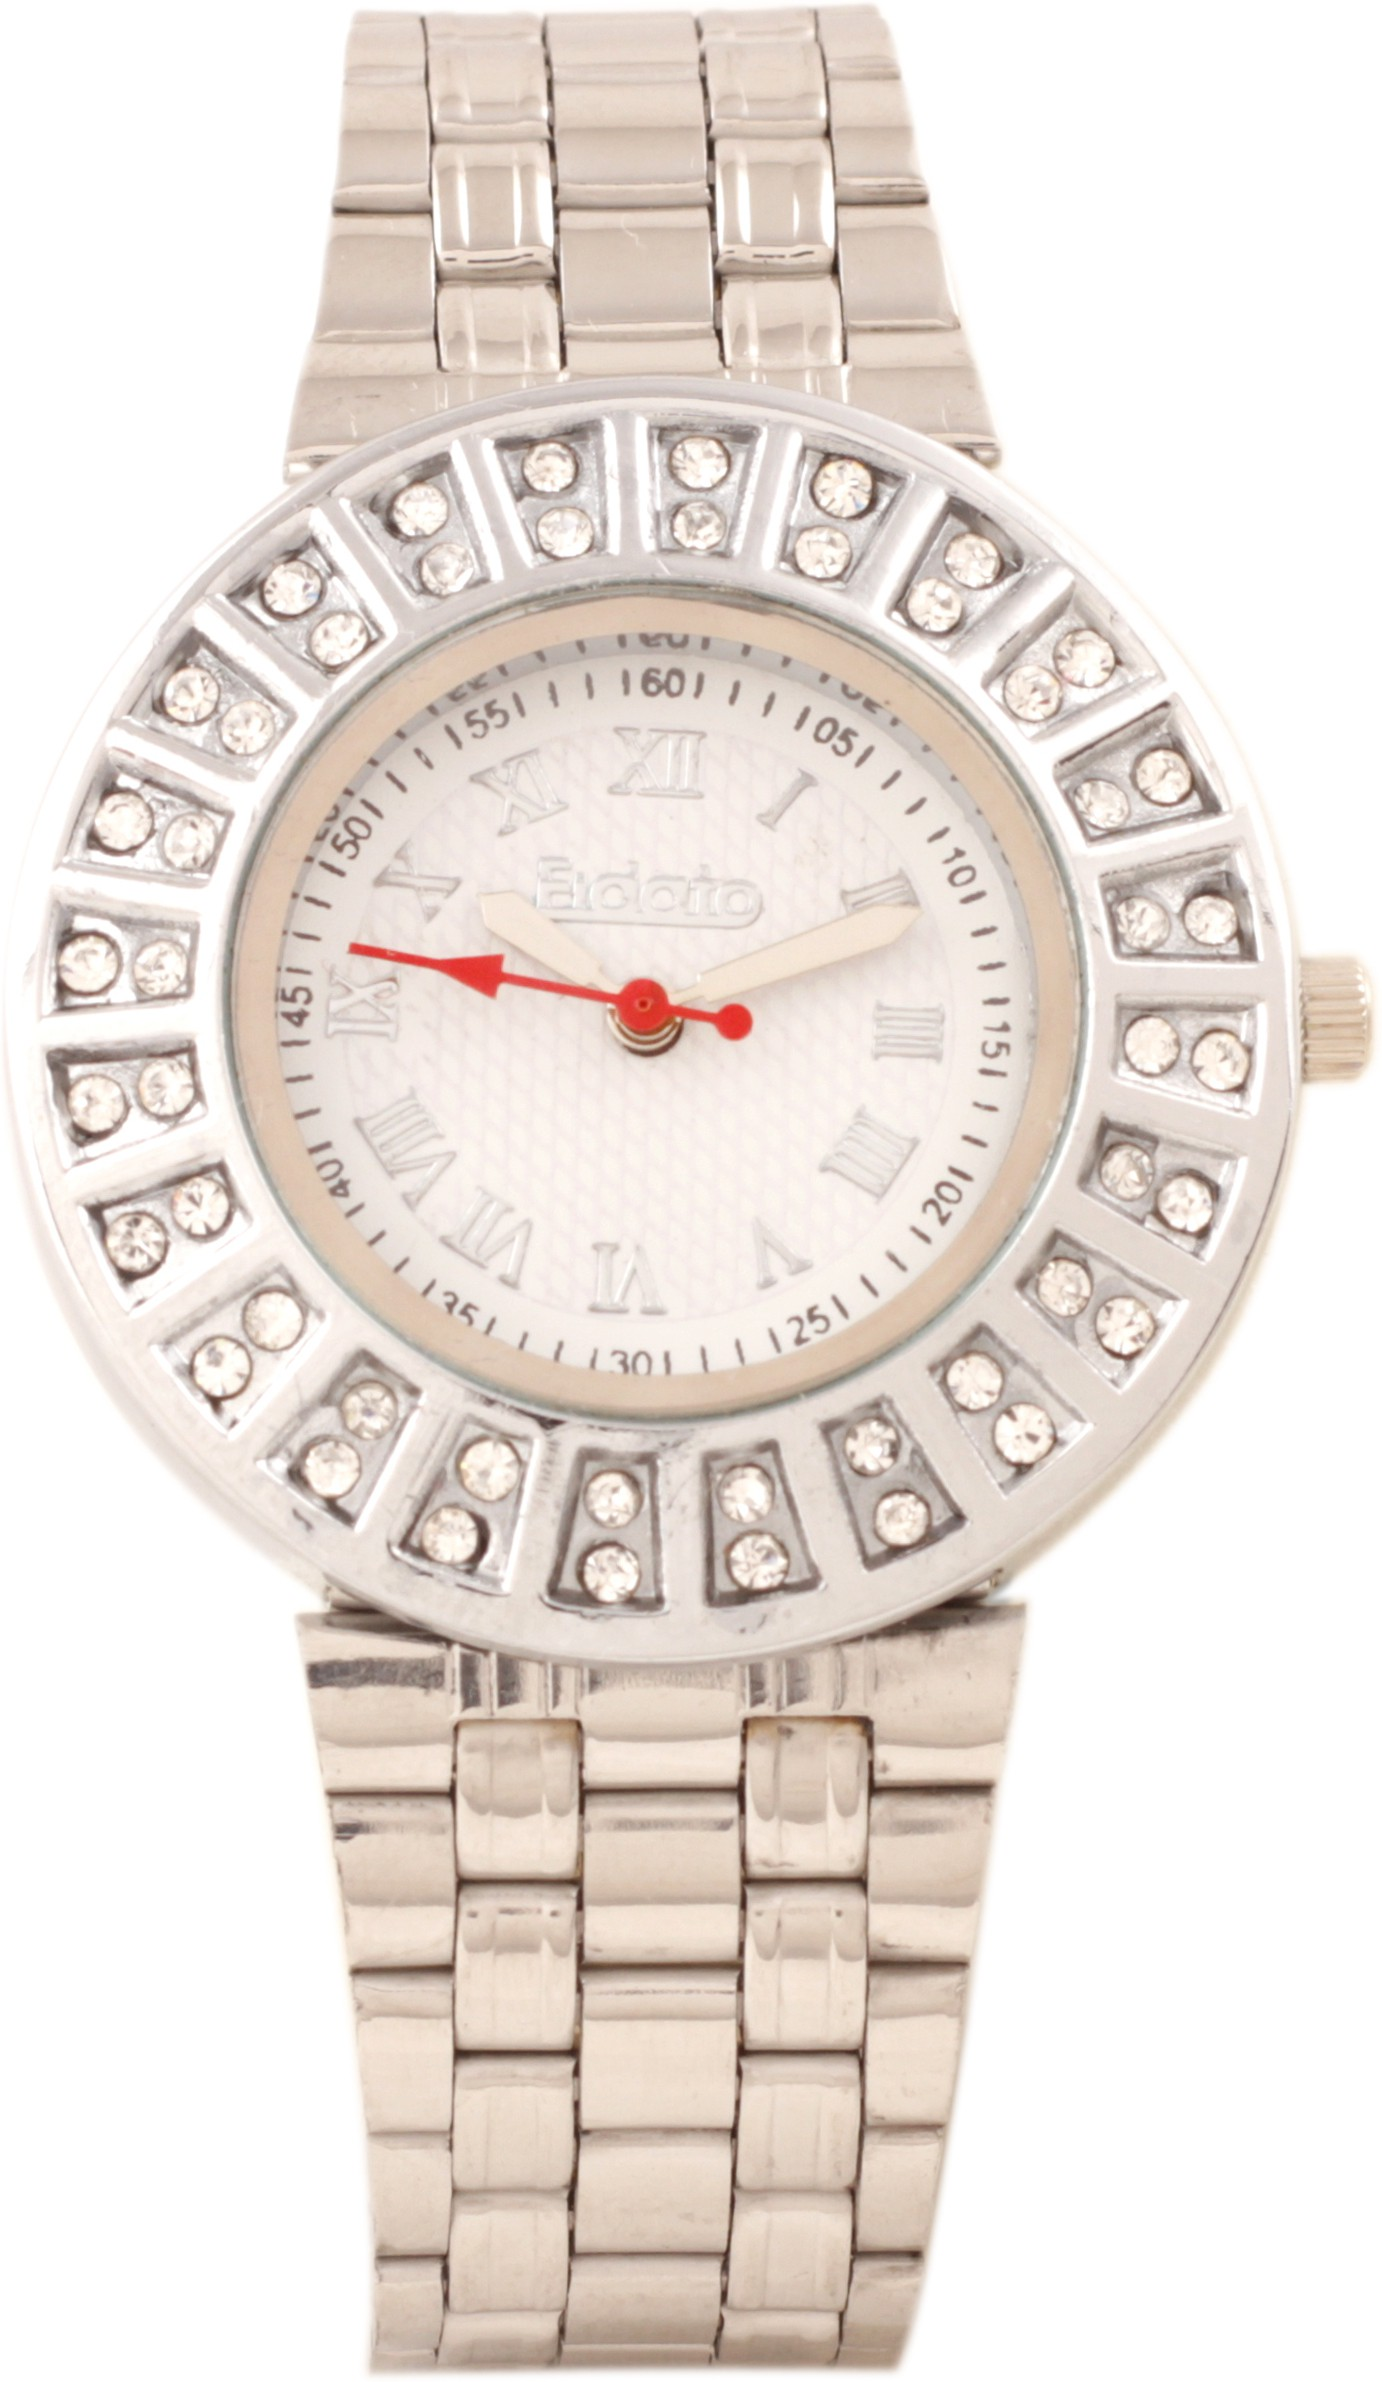 Flipkart - Watches Below Rs.349